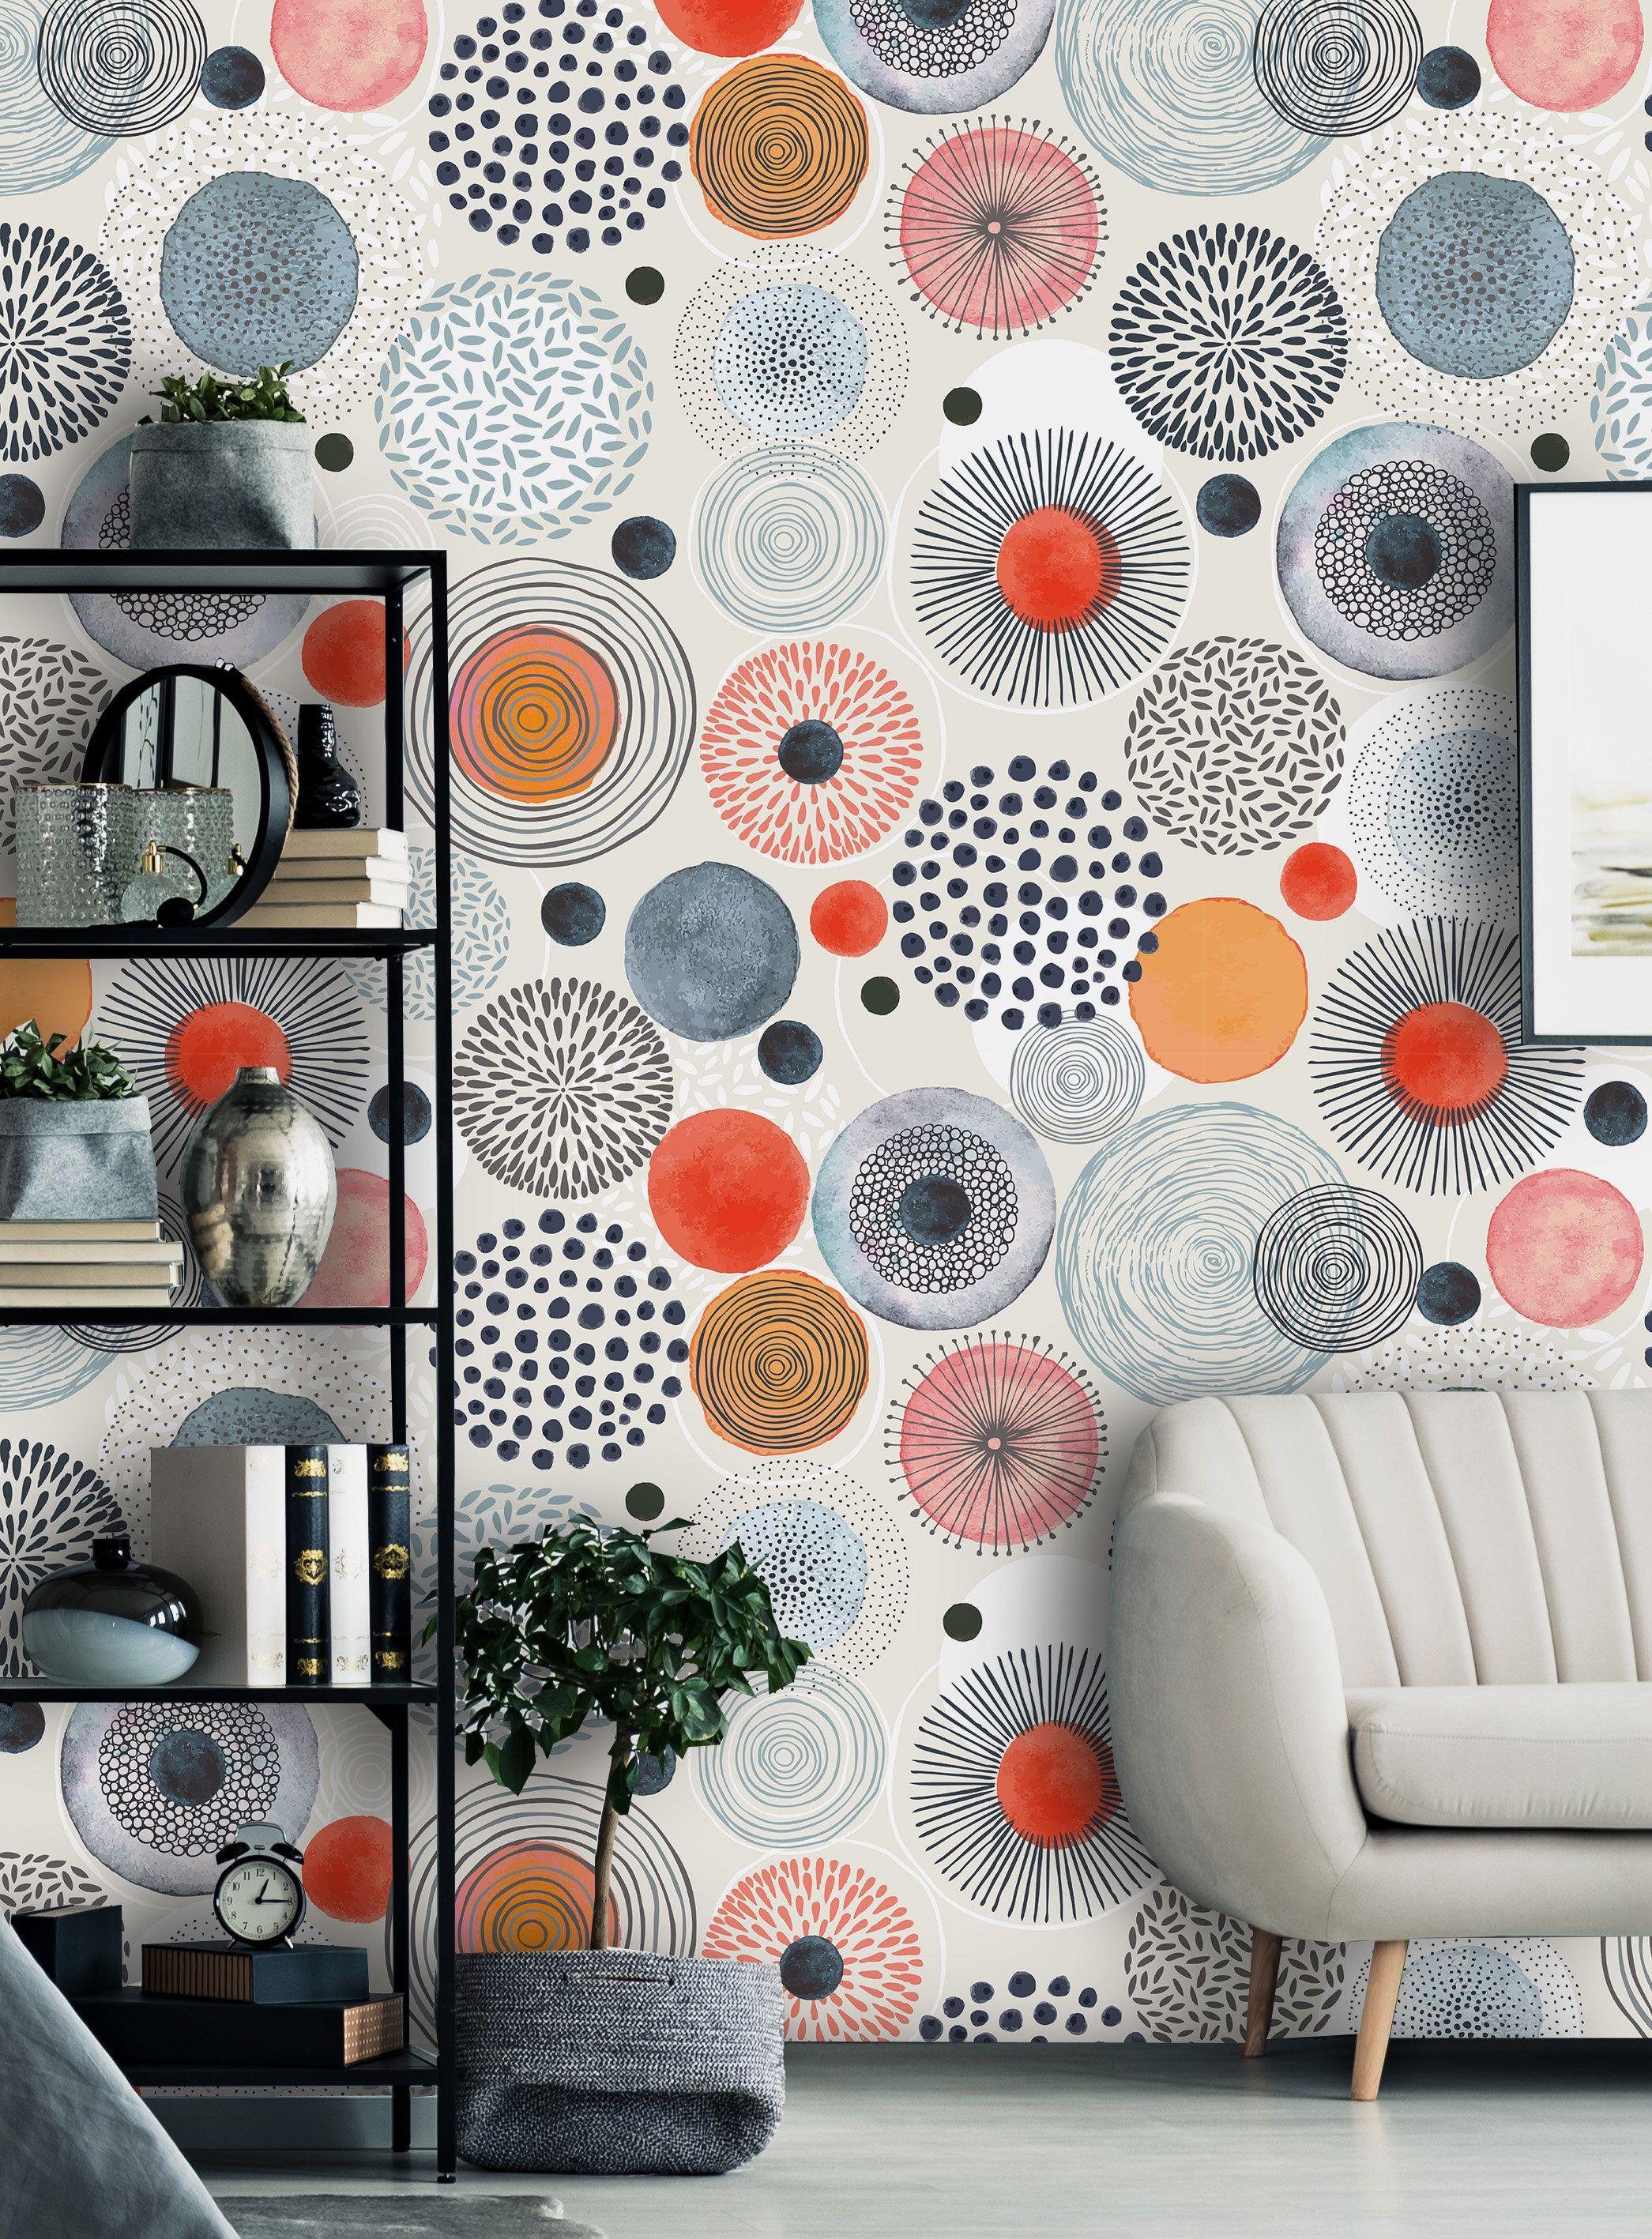 Removable Peel N Stick Wallpaper Self Adhesive Wall Etsy Peel N Stick Wallpaper Room Decor Decor